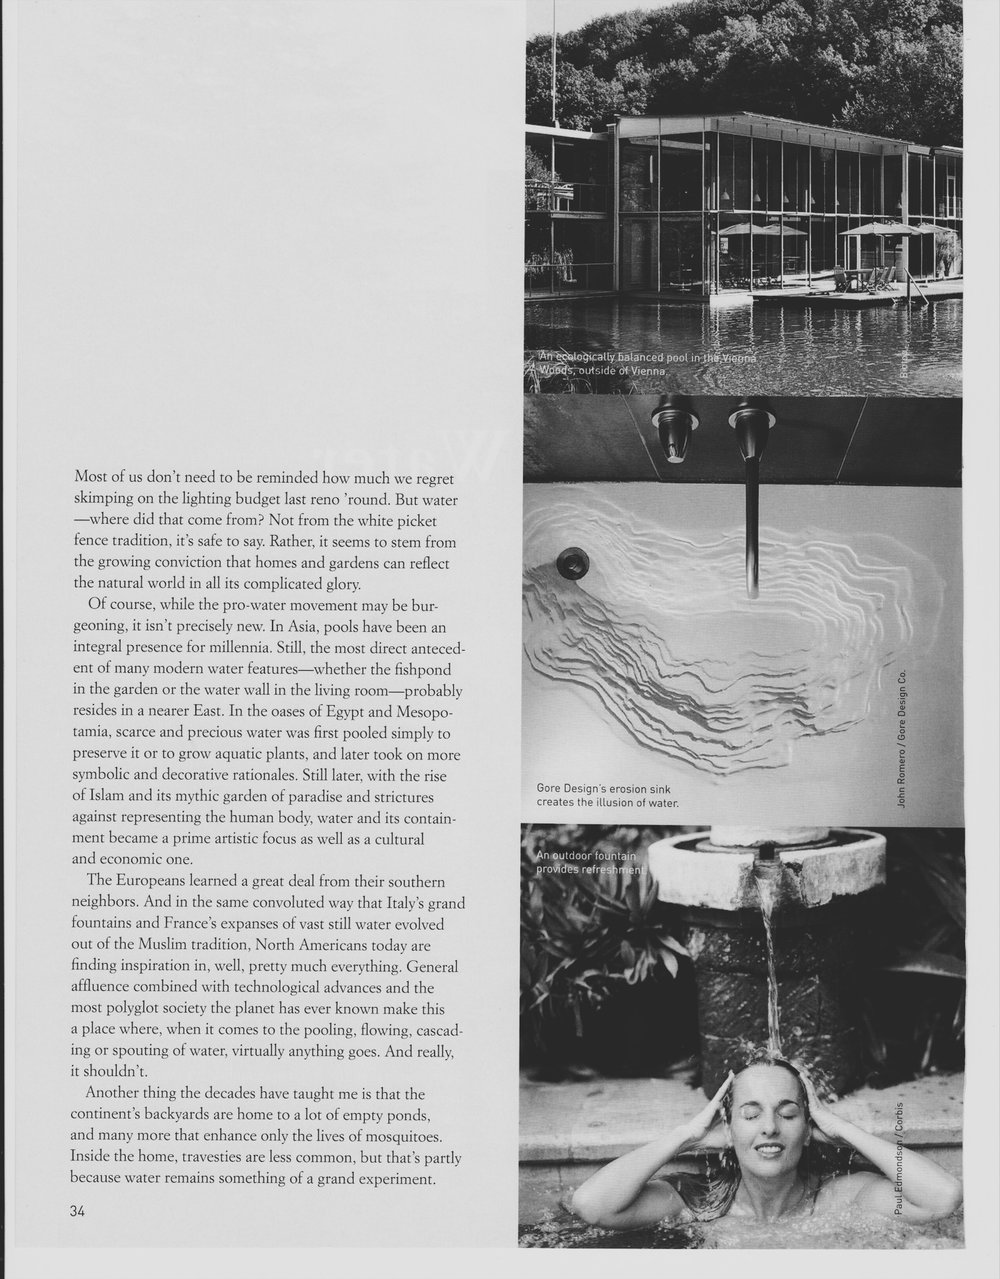 brandon-gore-print-publications-concrete-7086.JPG